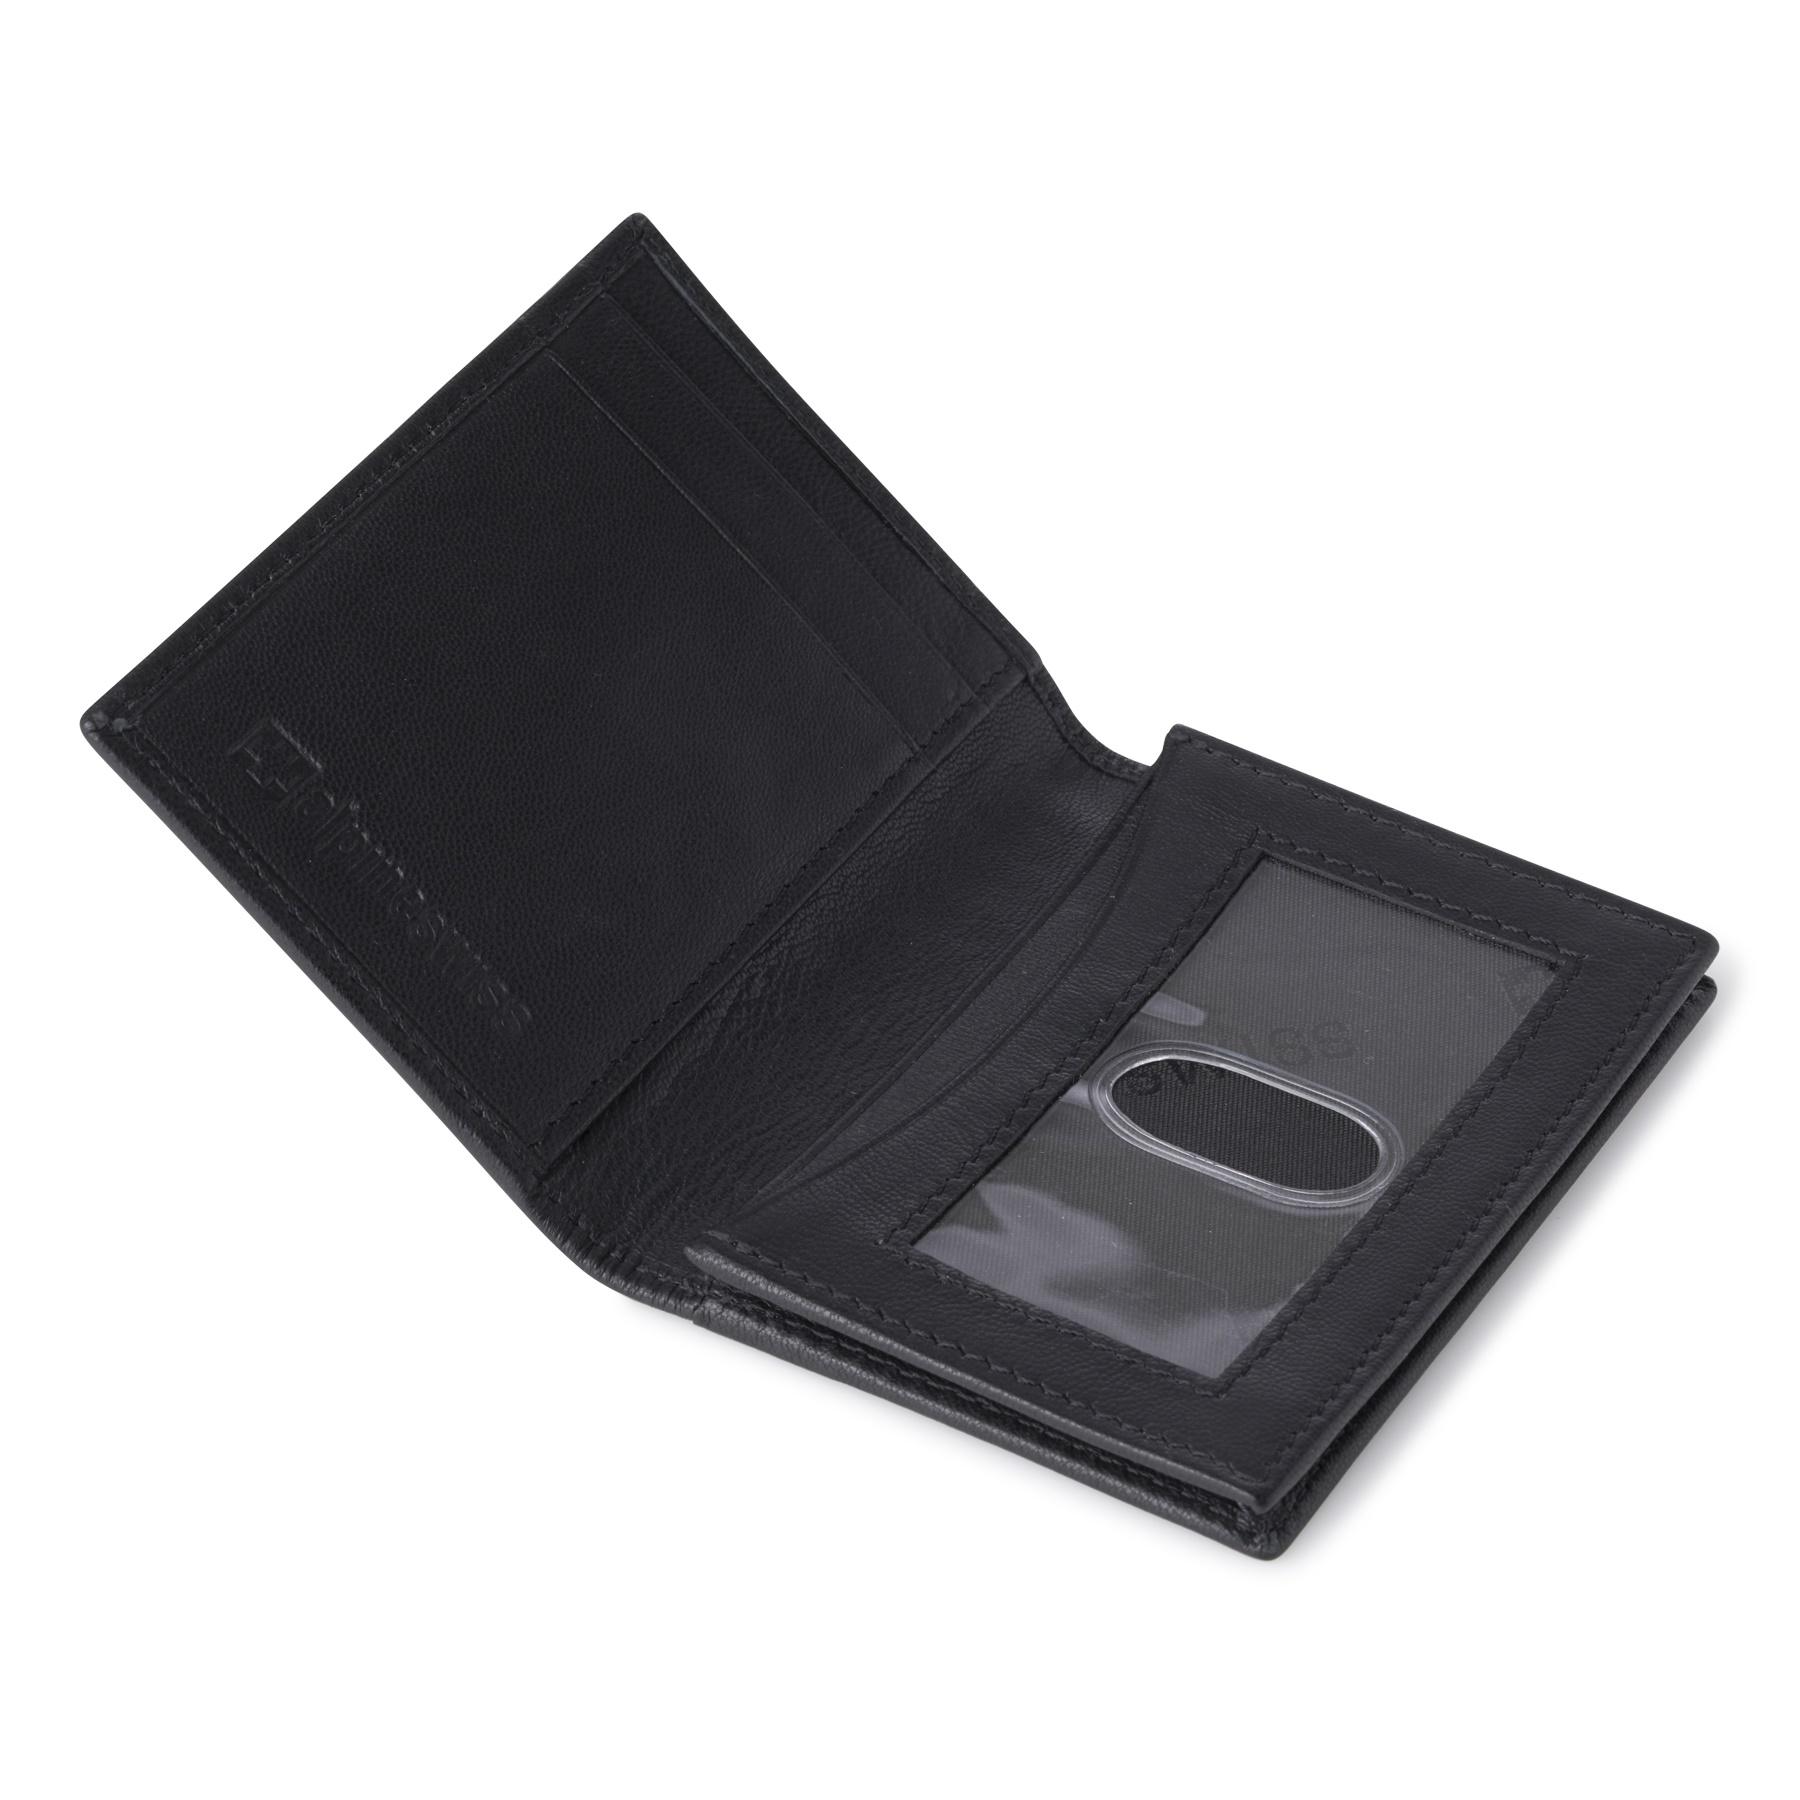 Alpine-Swiss-RFID-Leather-Business-Card-Wallet-Minimalist-ID-Window-Card-Holder thumbnail 15